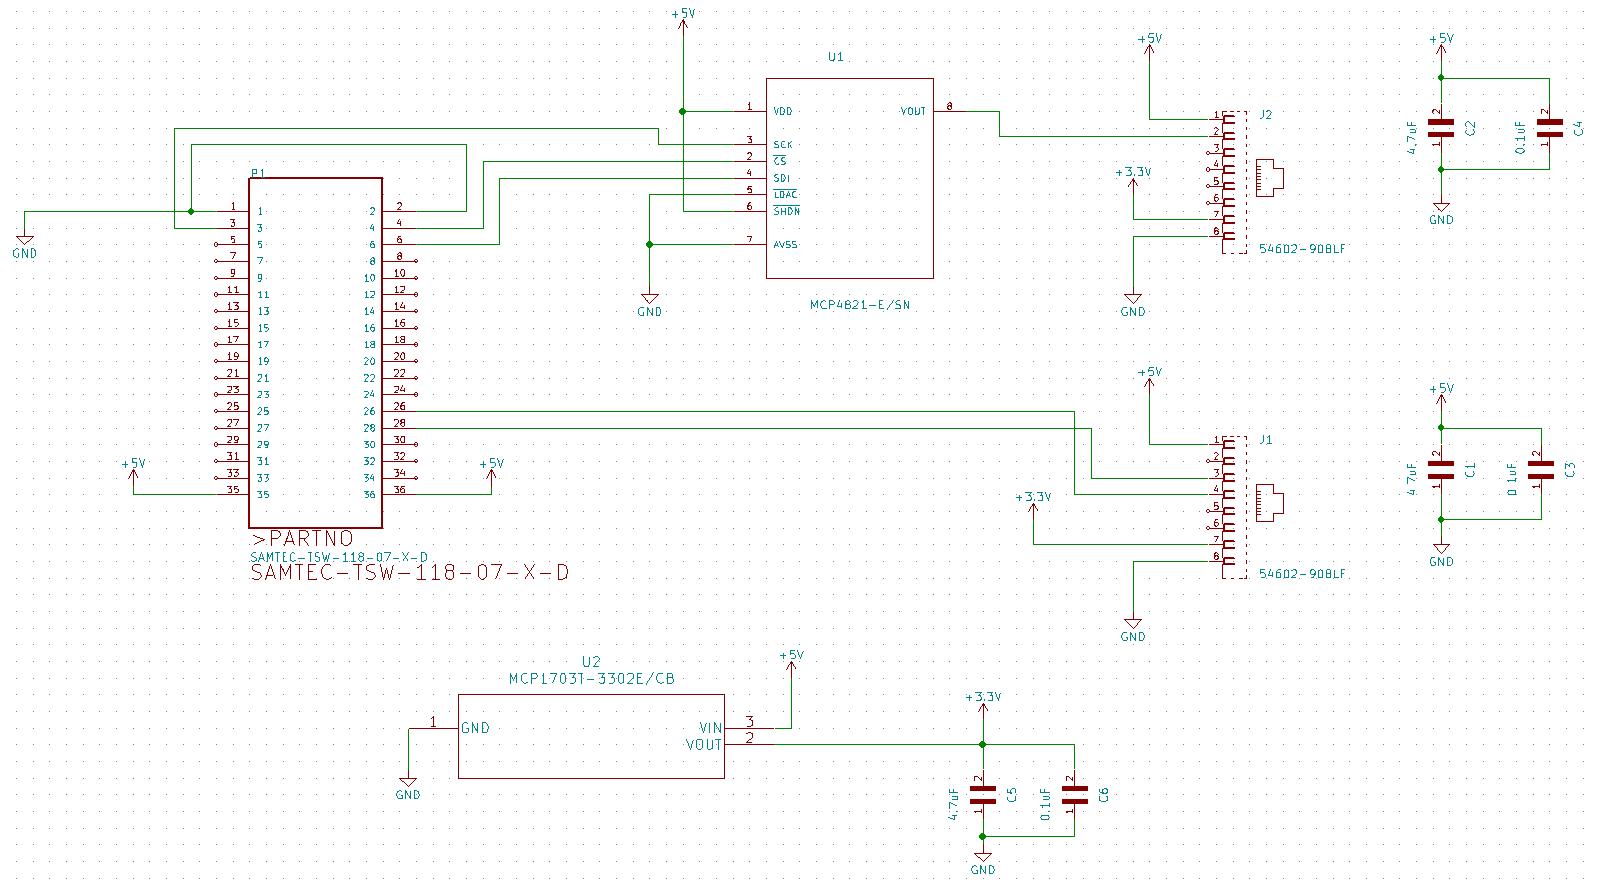 Building A Light Testing Tool Malt Windows Drivers Microsoft Docs 3v Lamp Brightness Controller Circuit Diagram Schematic